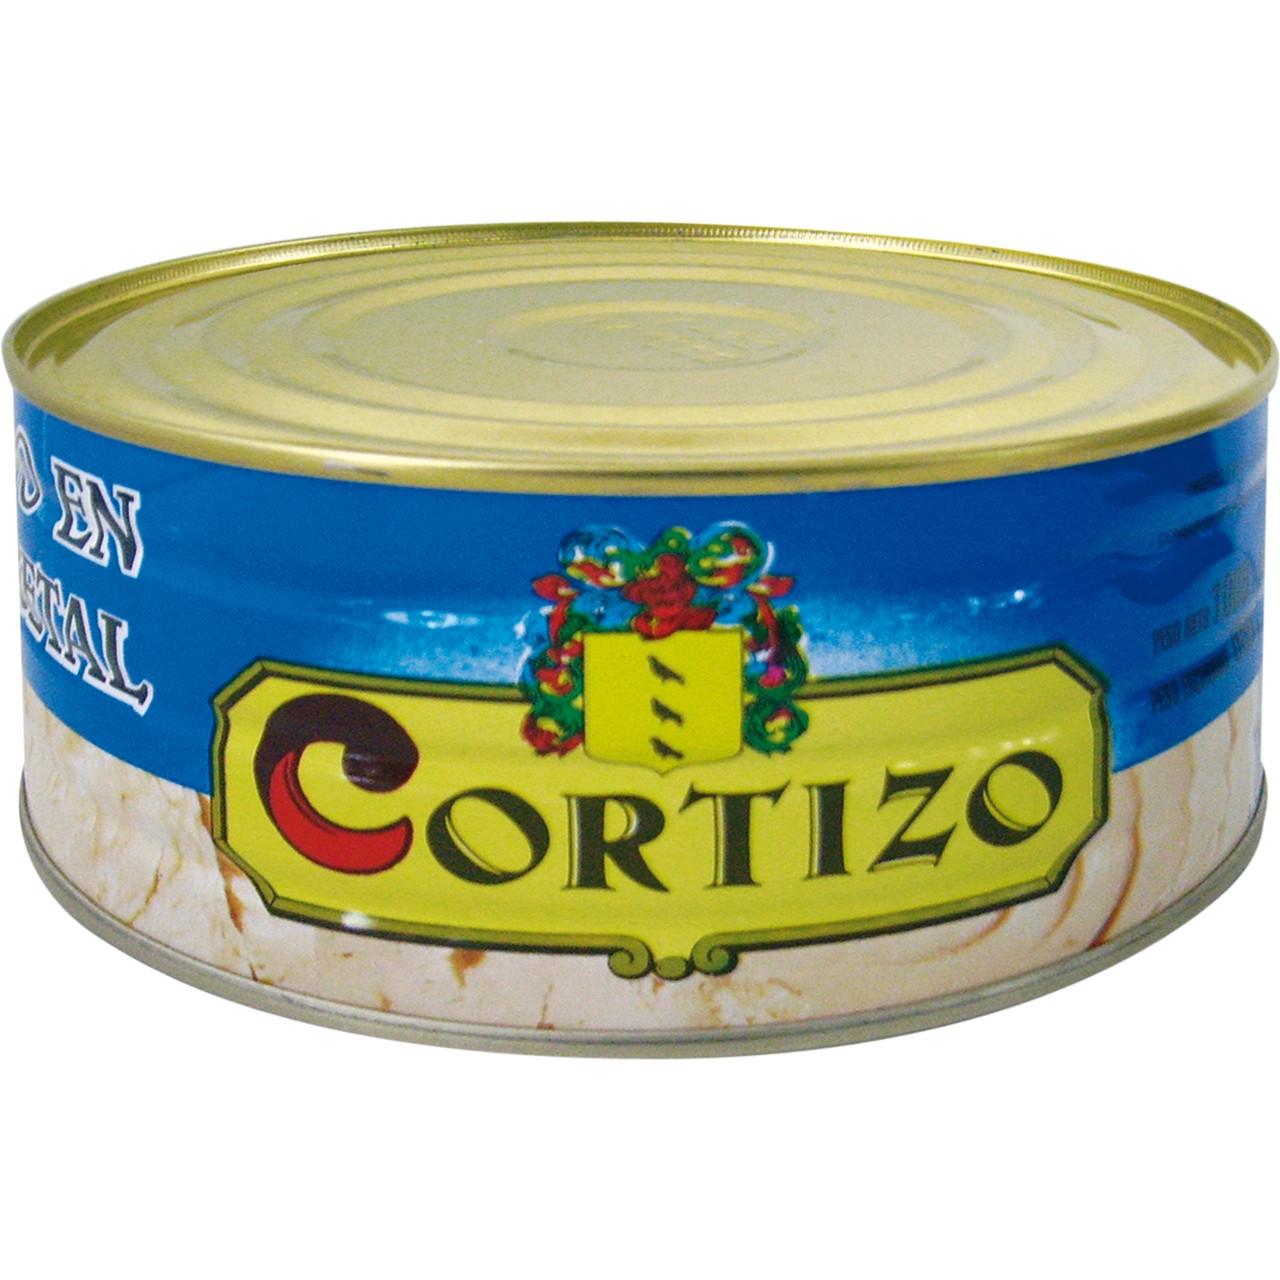 Tonyina cl.o.veg.ro-900 Cortizo blau